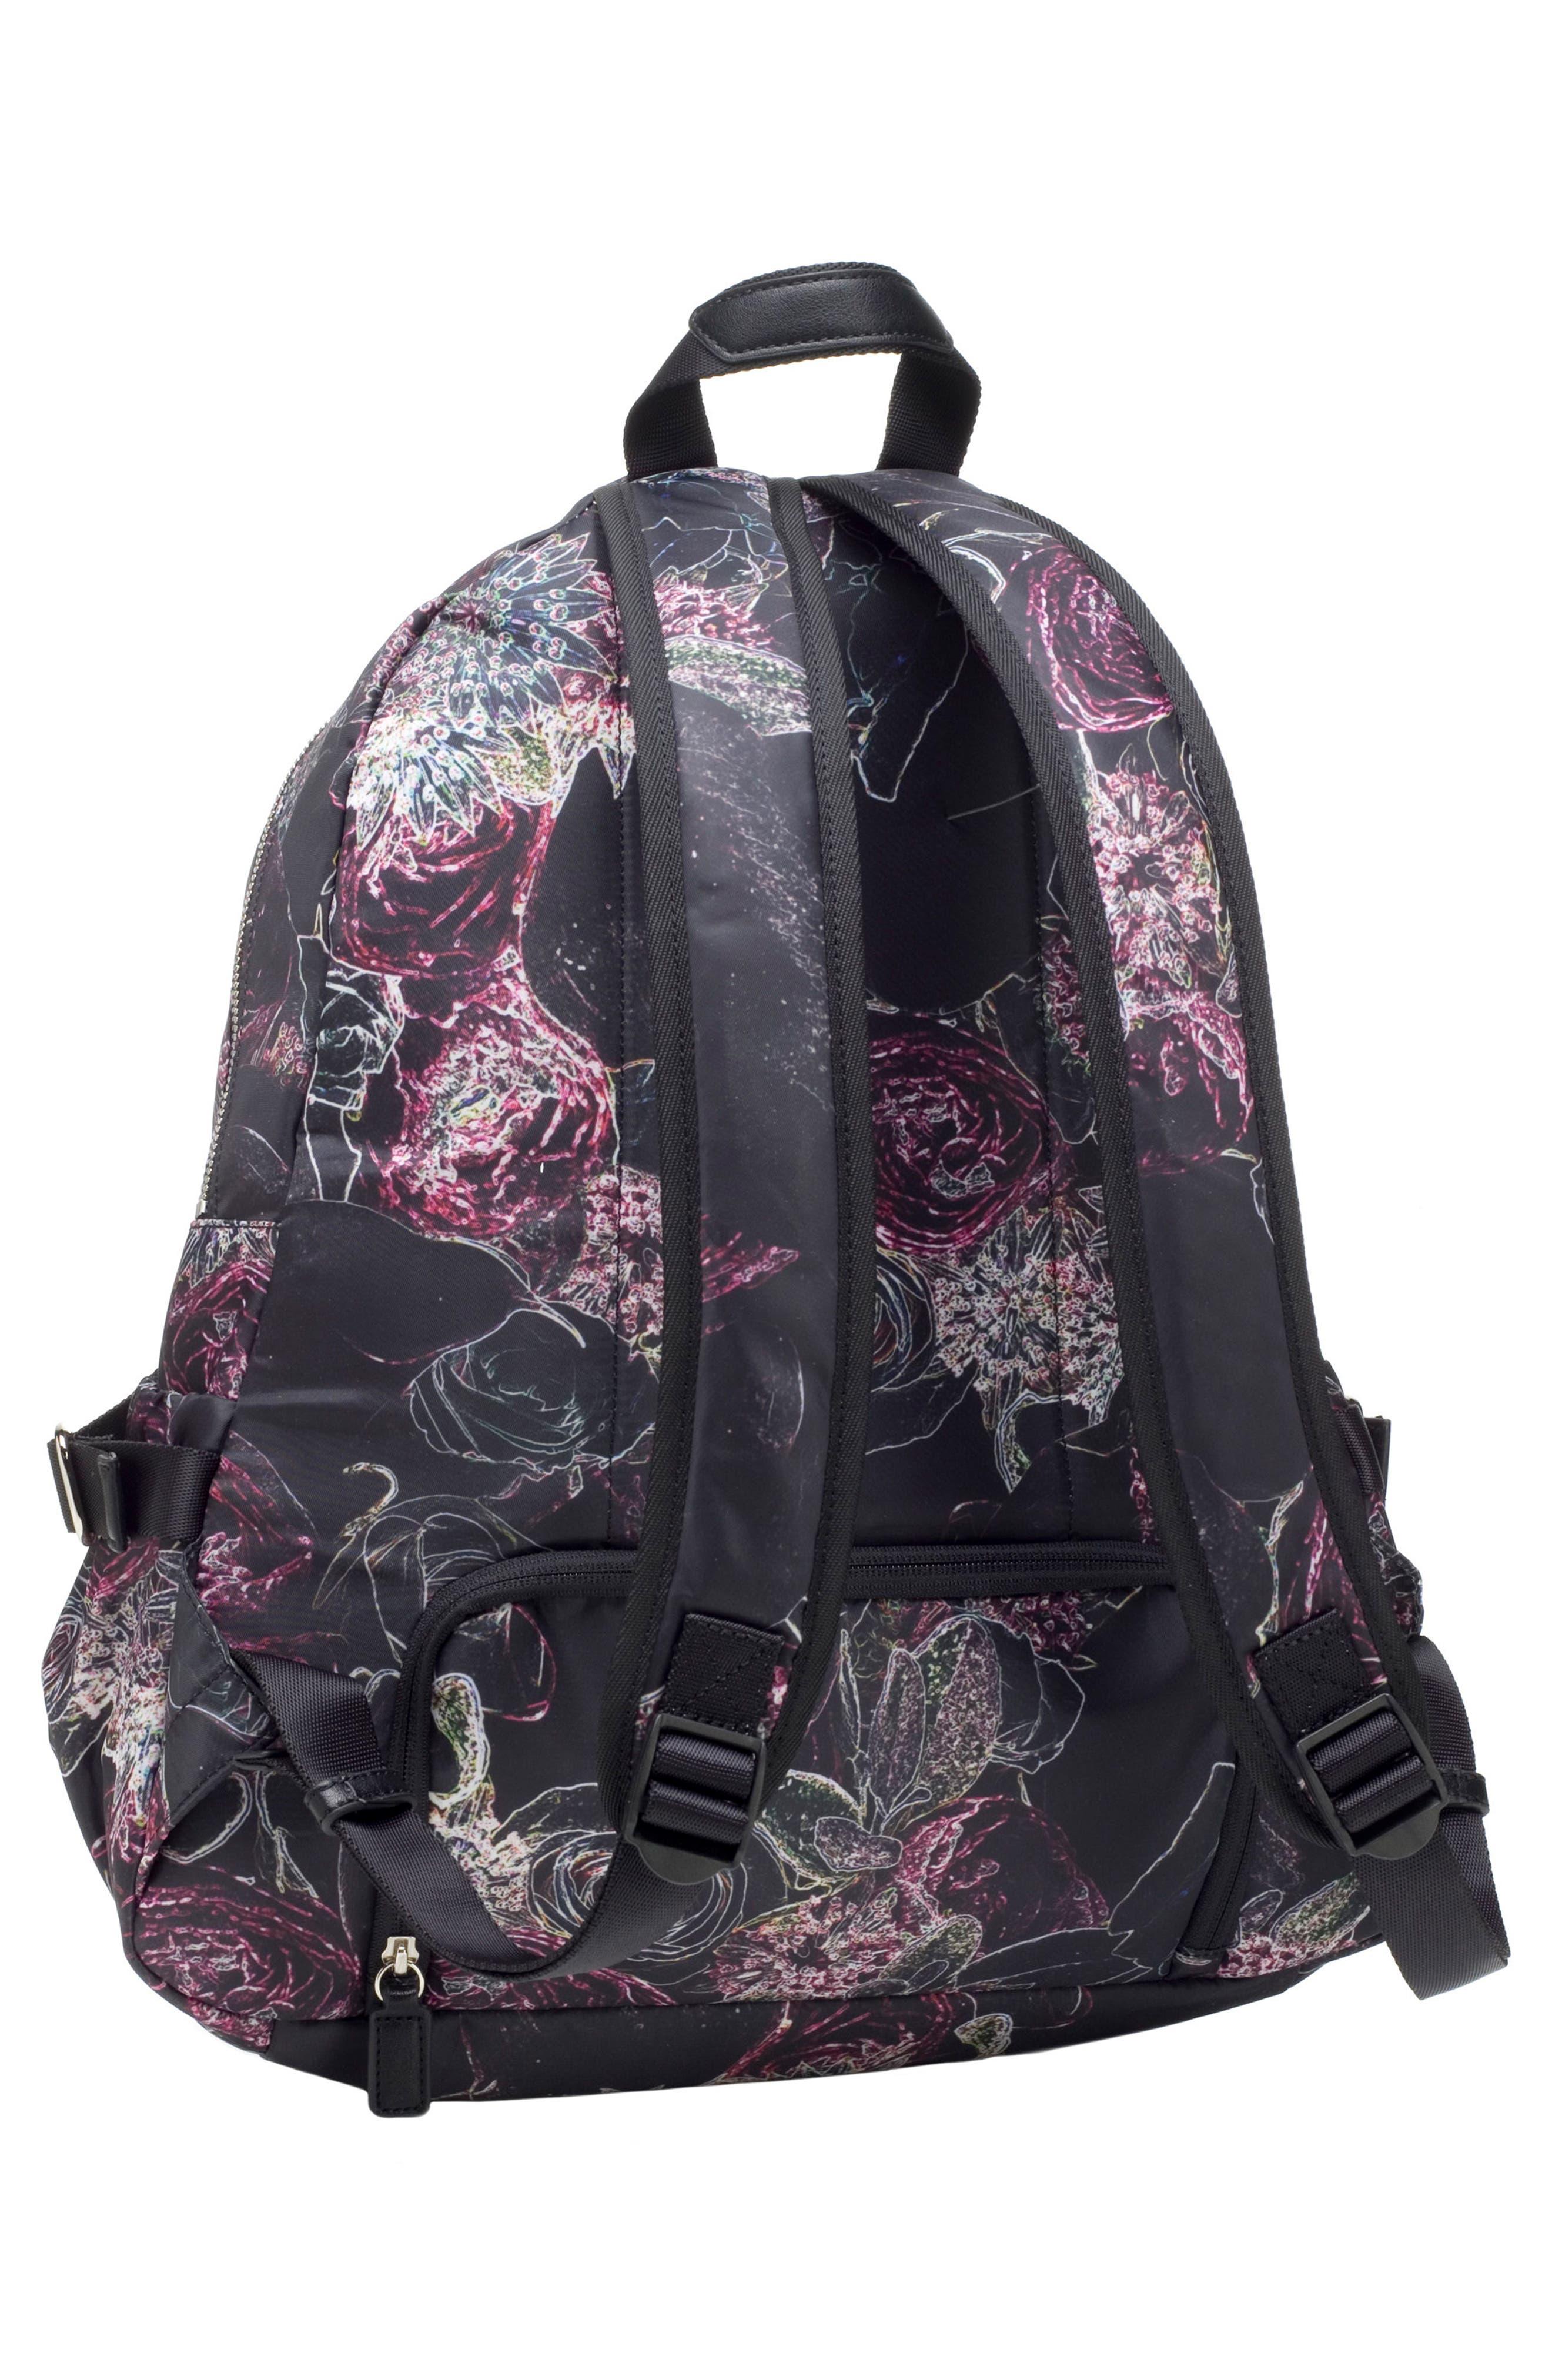 Hero Water Resistant Nylon Backpack Diaper Bag,                             Alternate thumbnail 15, color,                             Neon Floral